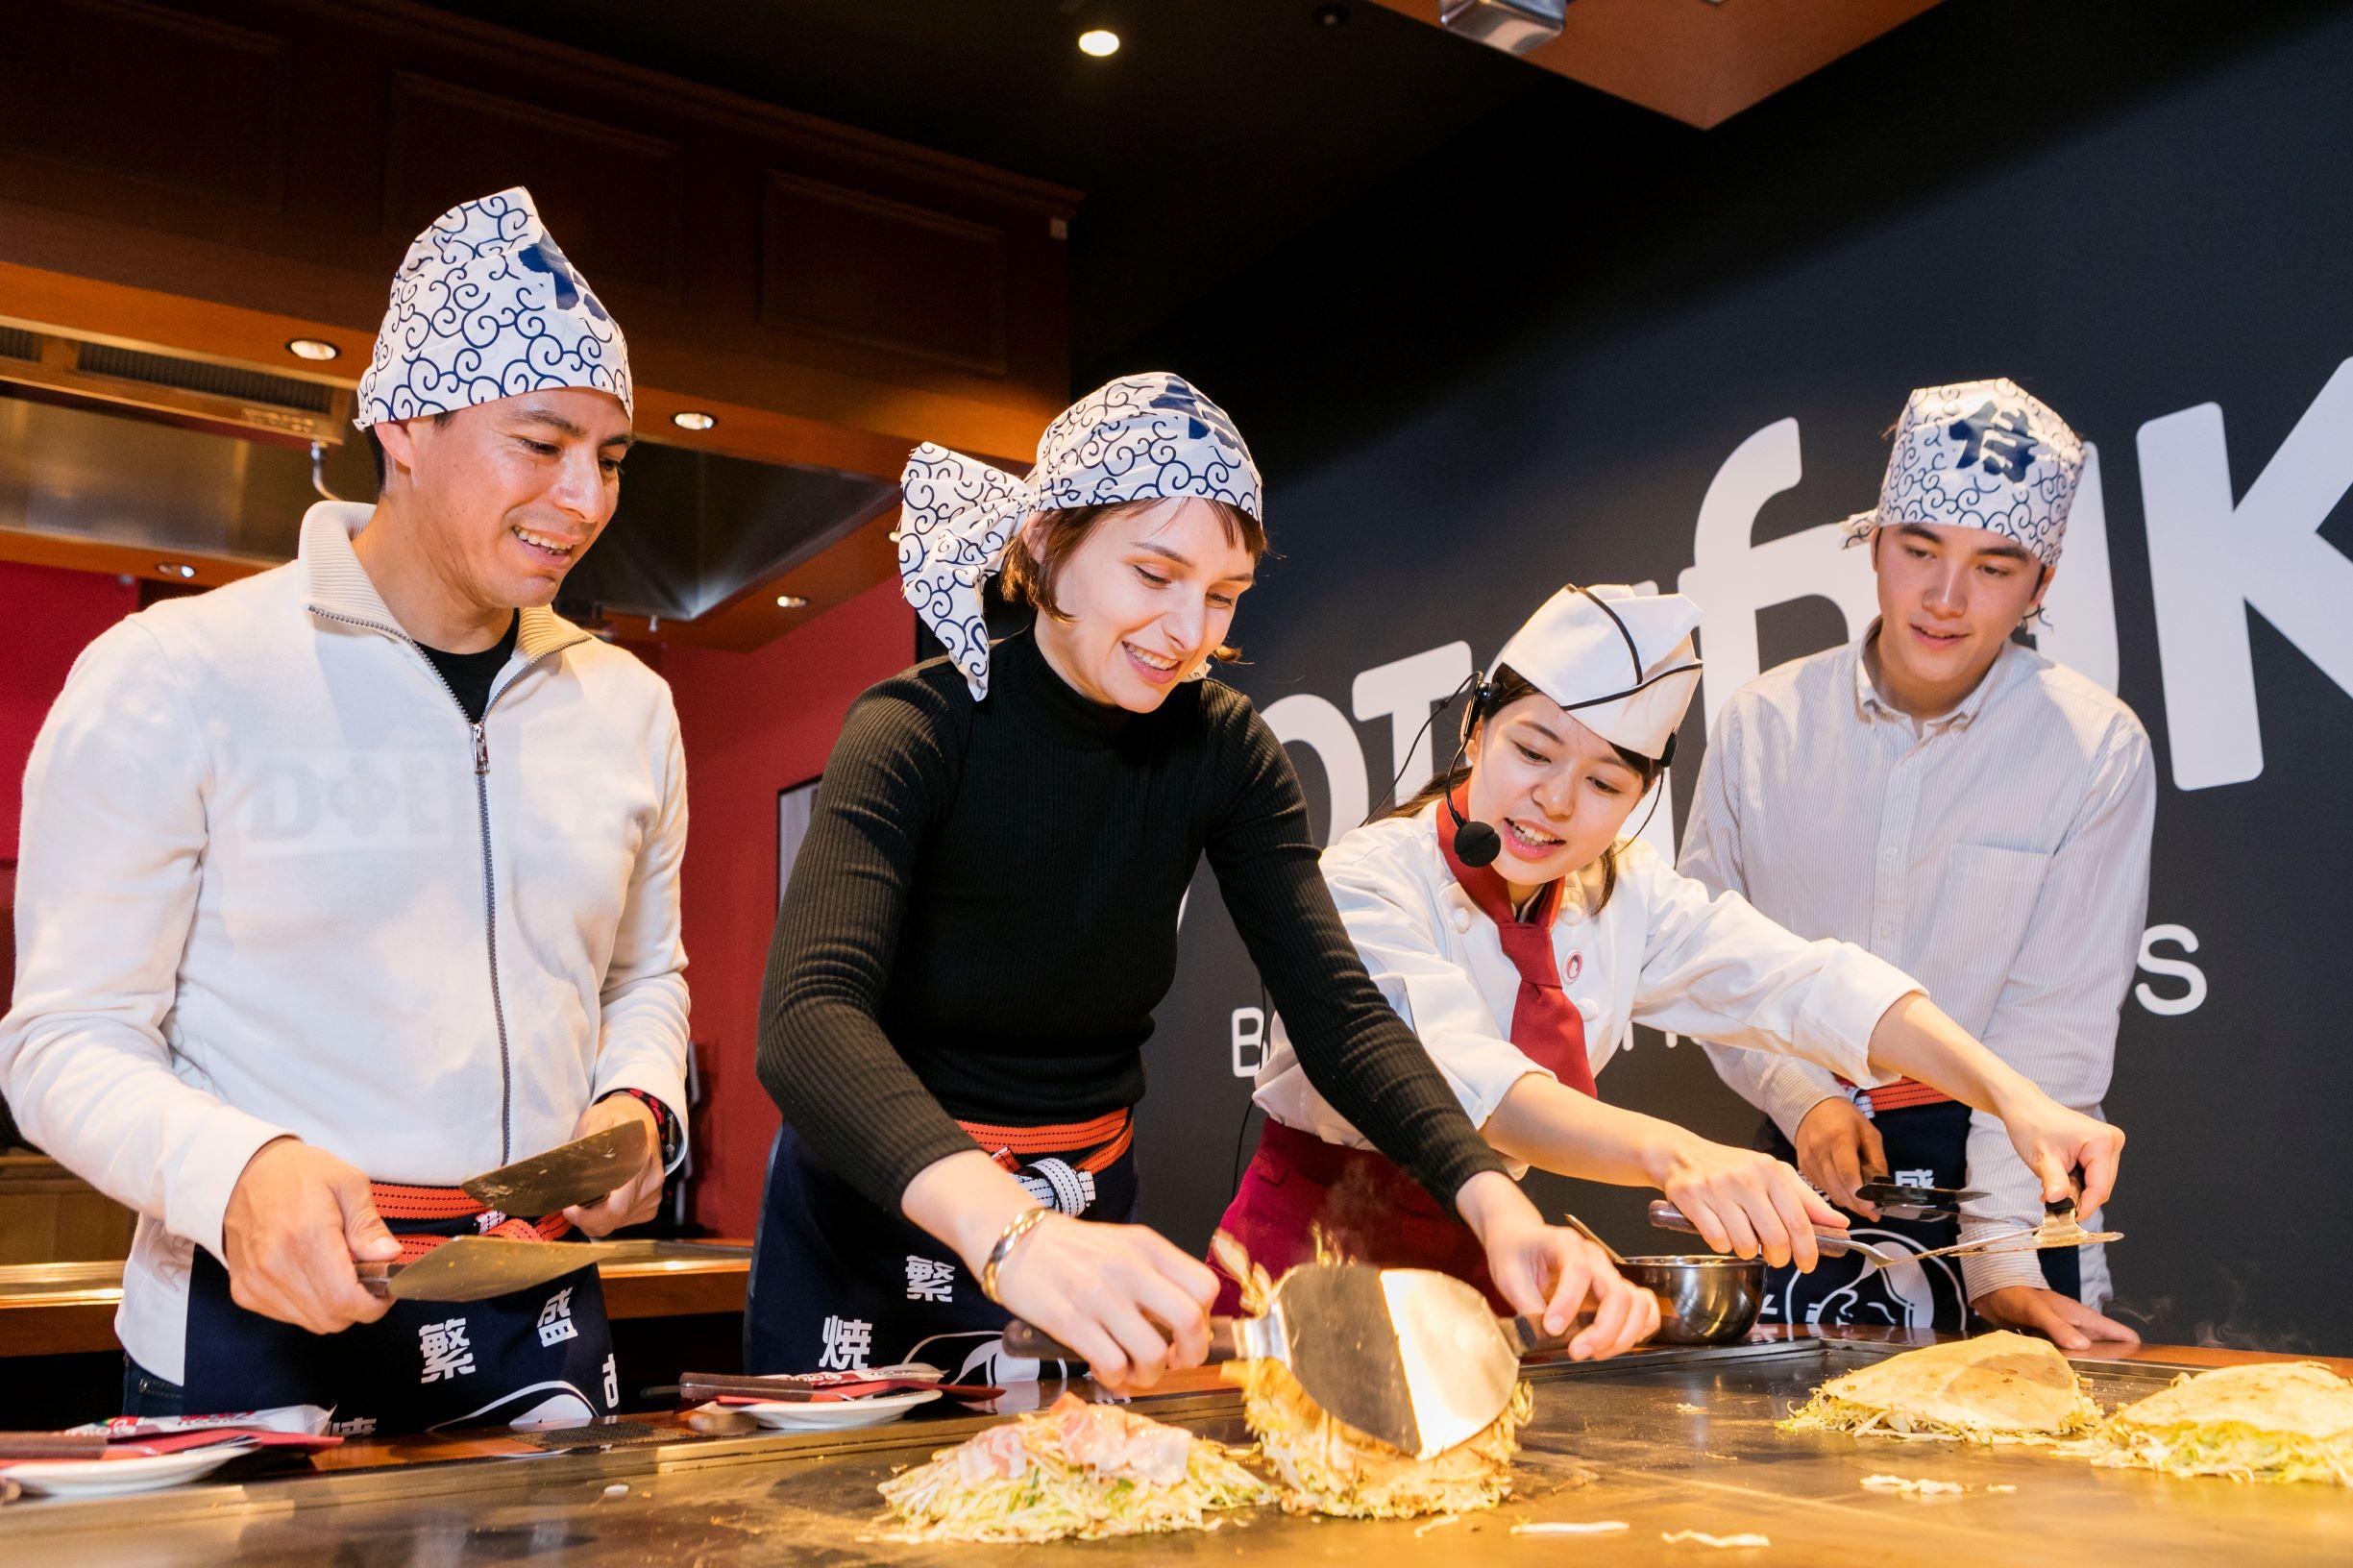 Hiroshima's #1 Food--Okonomiyaki Cooking Experience